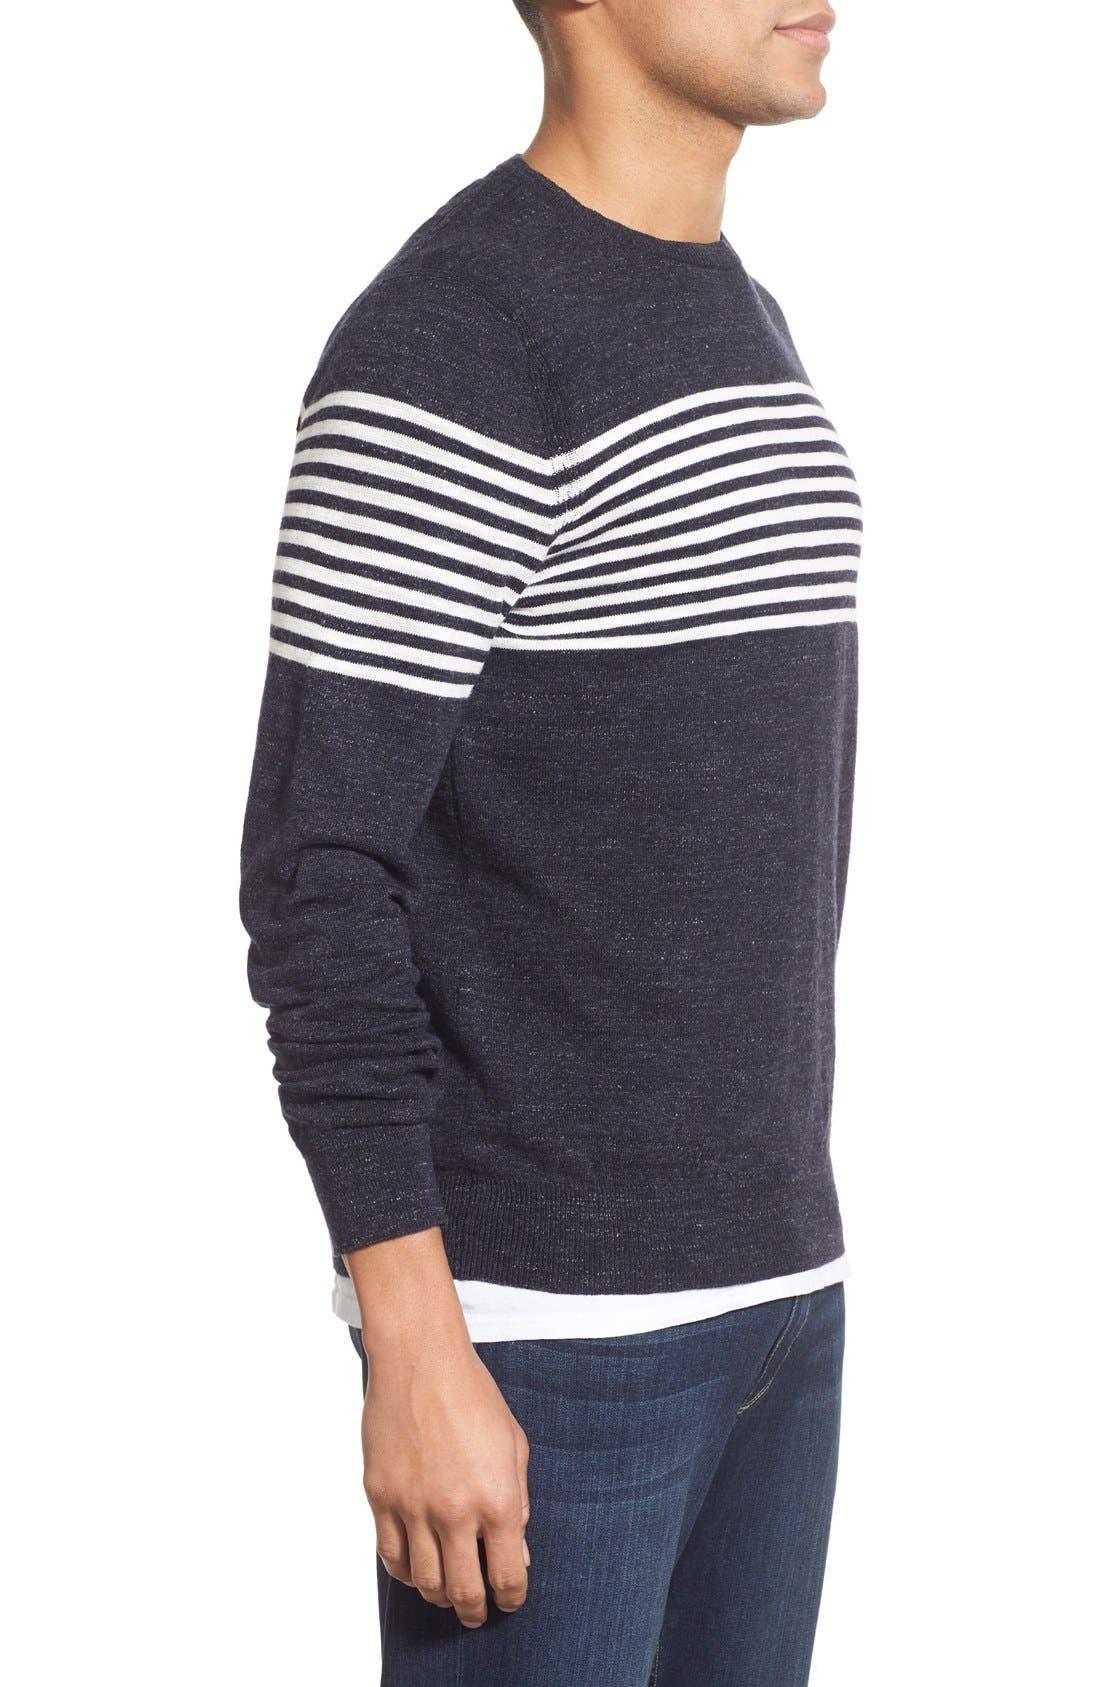 'Shore Club' Chest Stripe Crewneck Sweater,                             Alternate thumbnail 3, color,                             Navy